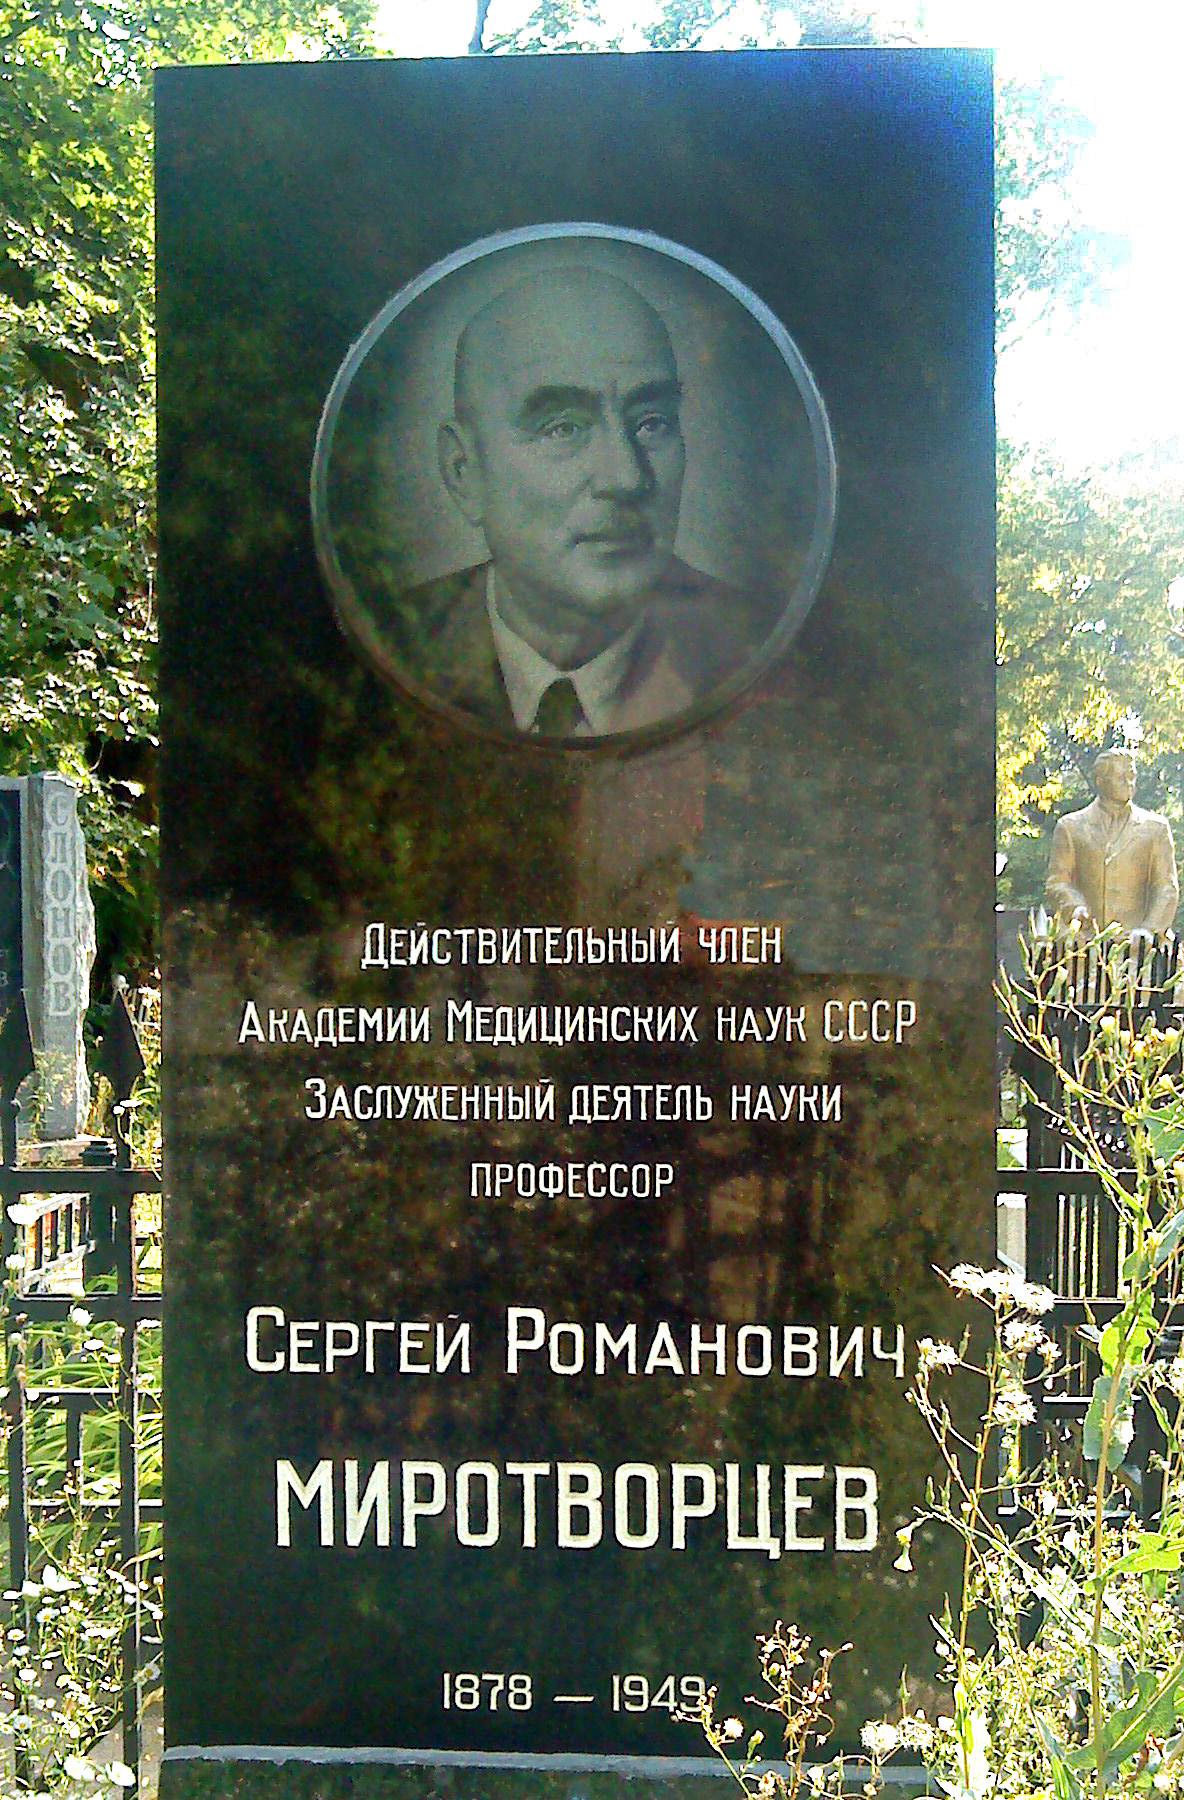 https://upload.wikimedia.org/wikipedia/ru/1/1d/Mirotvorcev_SR-Memo.jpg